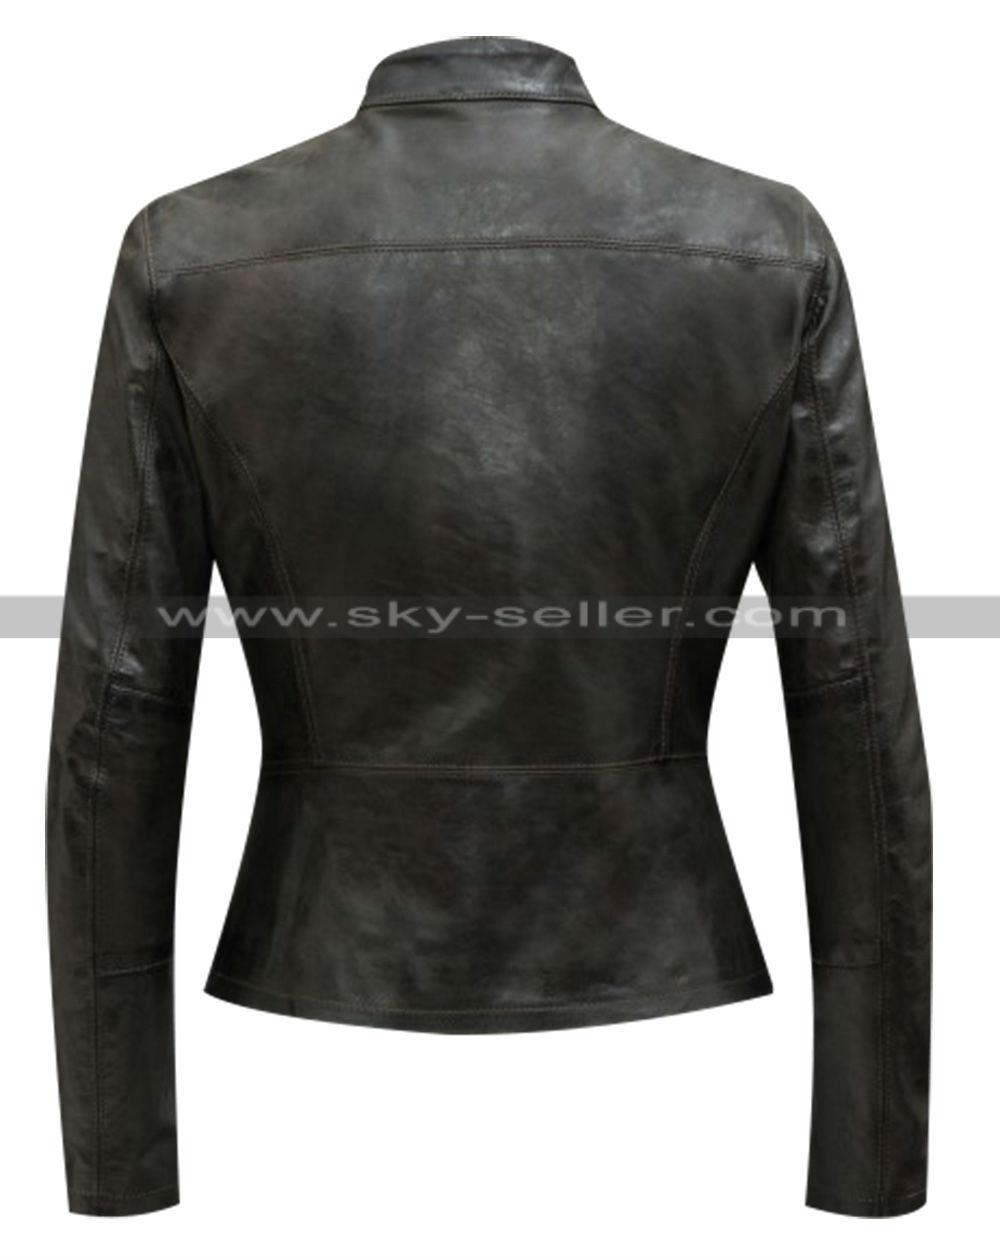 force leather jacket: